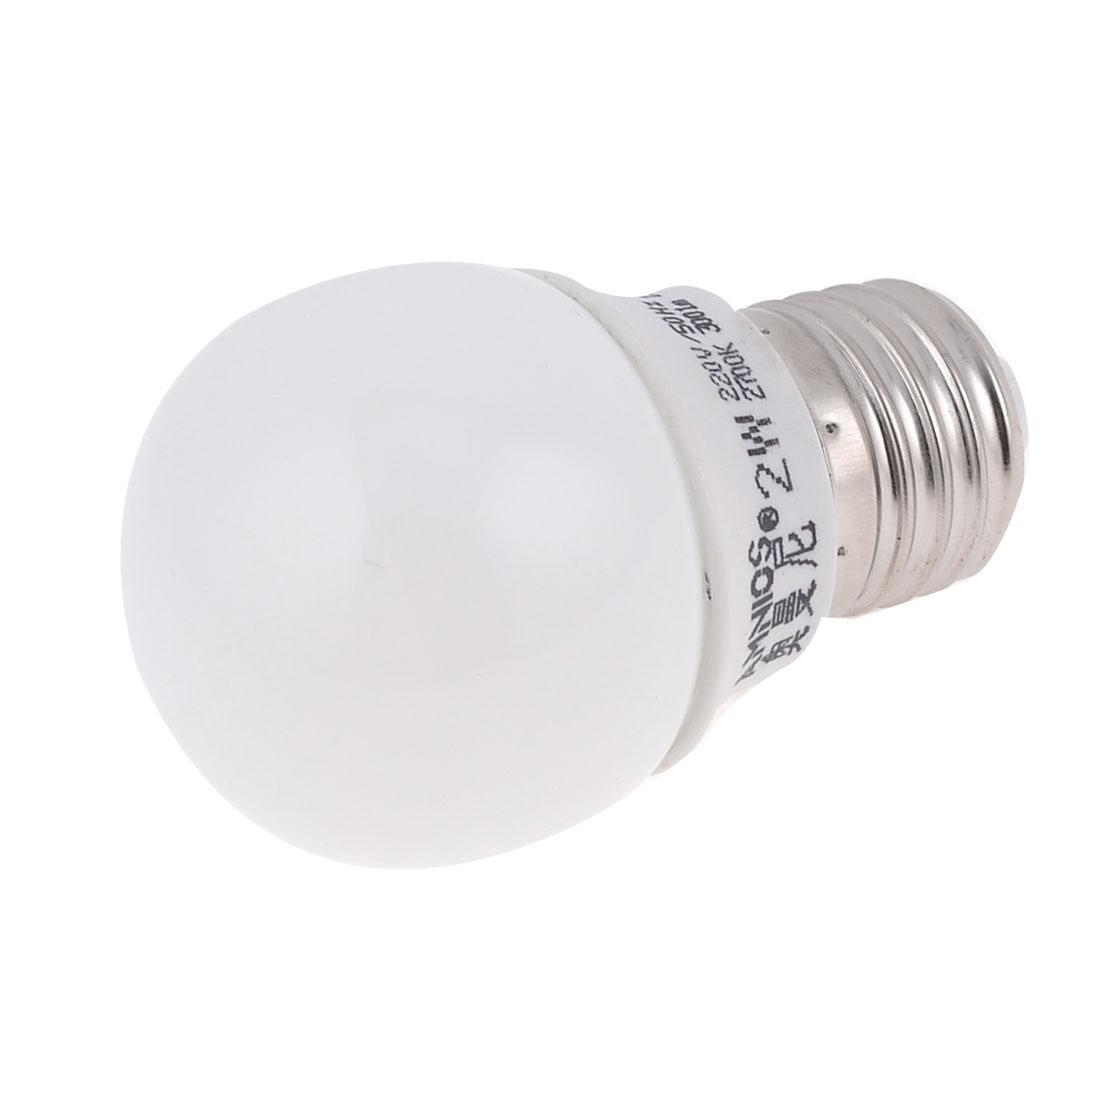 E27 Base 2W AC 220V Warm White Light Ball Shape LED Bulb Lamp